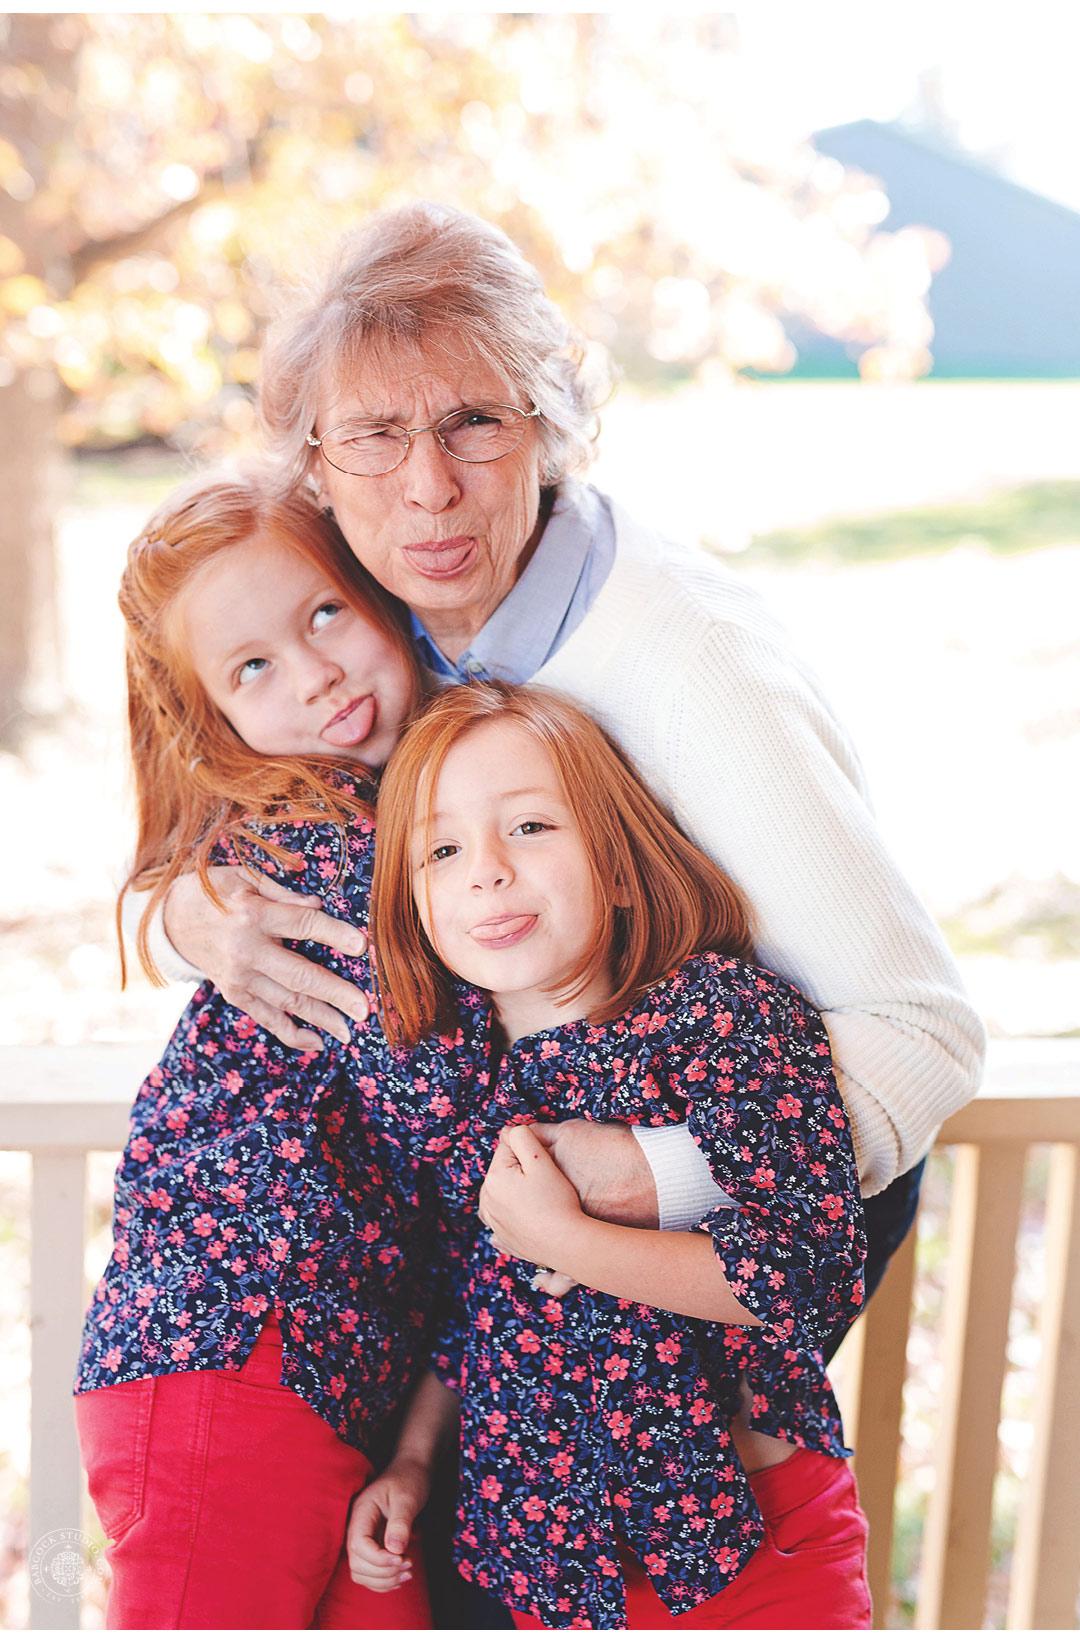 zahumensky-family-dayton-photographer-children-5.jpg